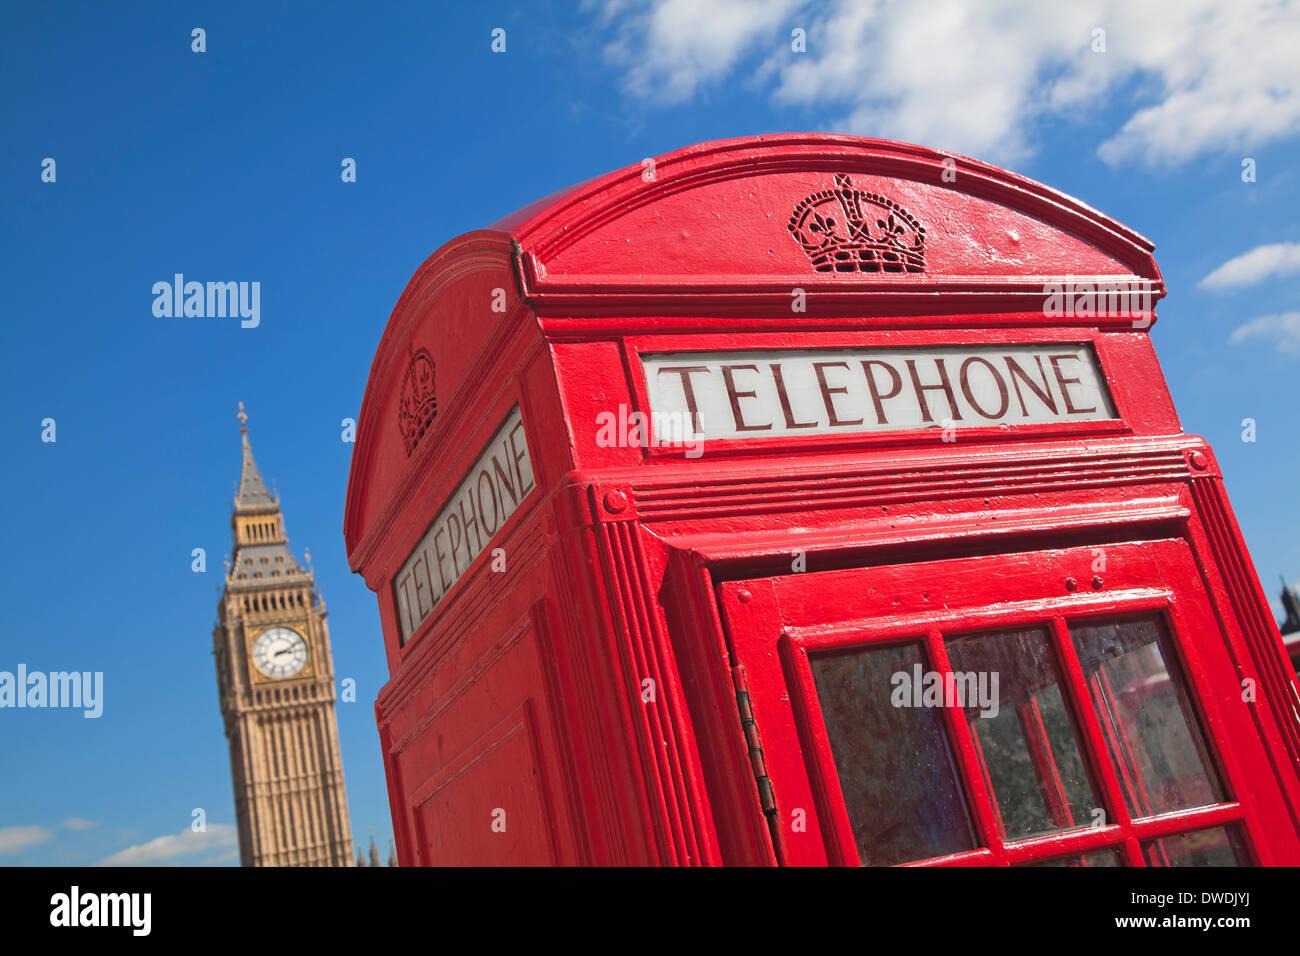 Cuadro teléfono rojo en Londres, Gran Bretaña. Imagen De Stock